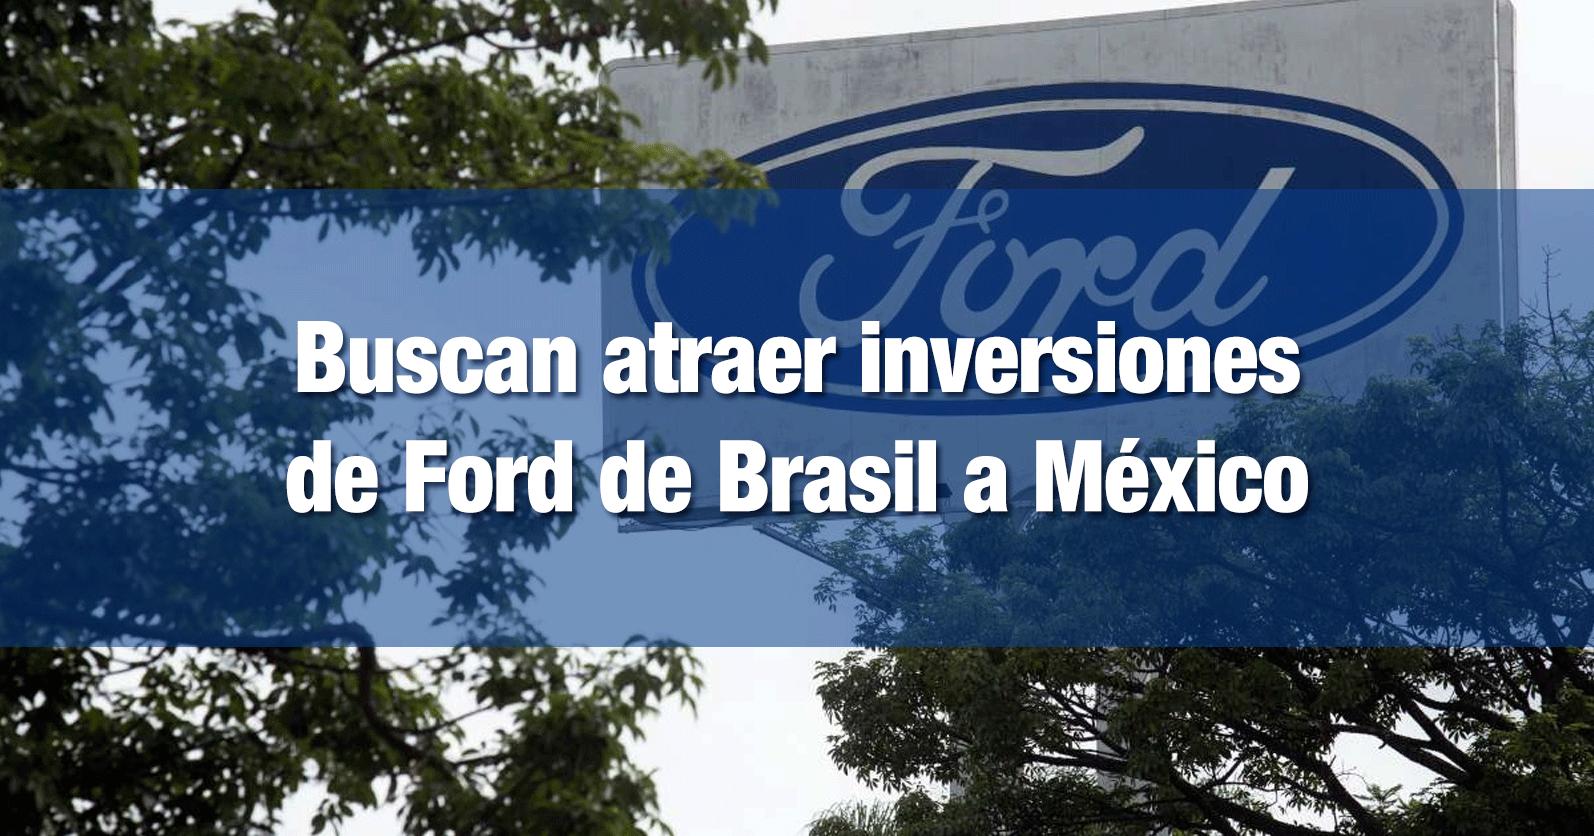 Buscan atraer inversiones de Ford de Brasil a México